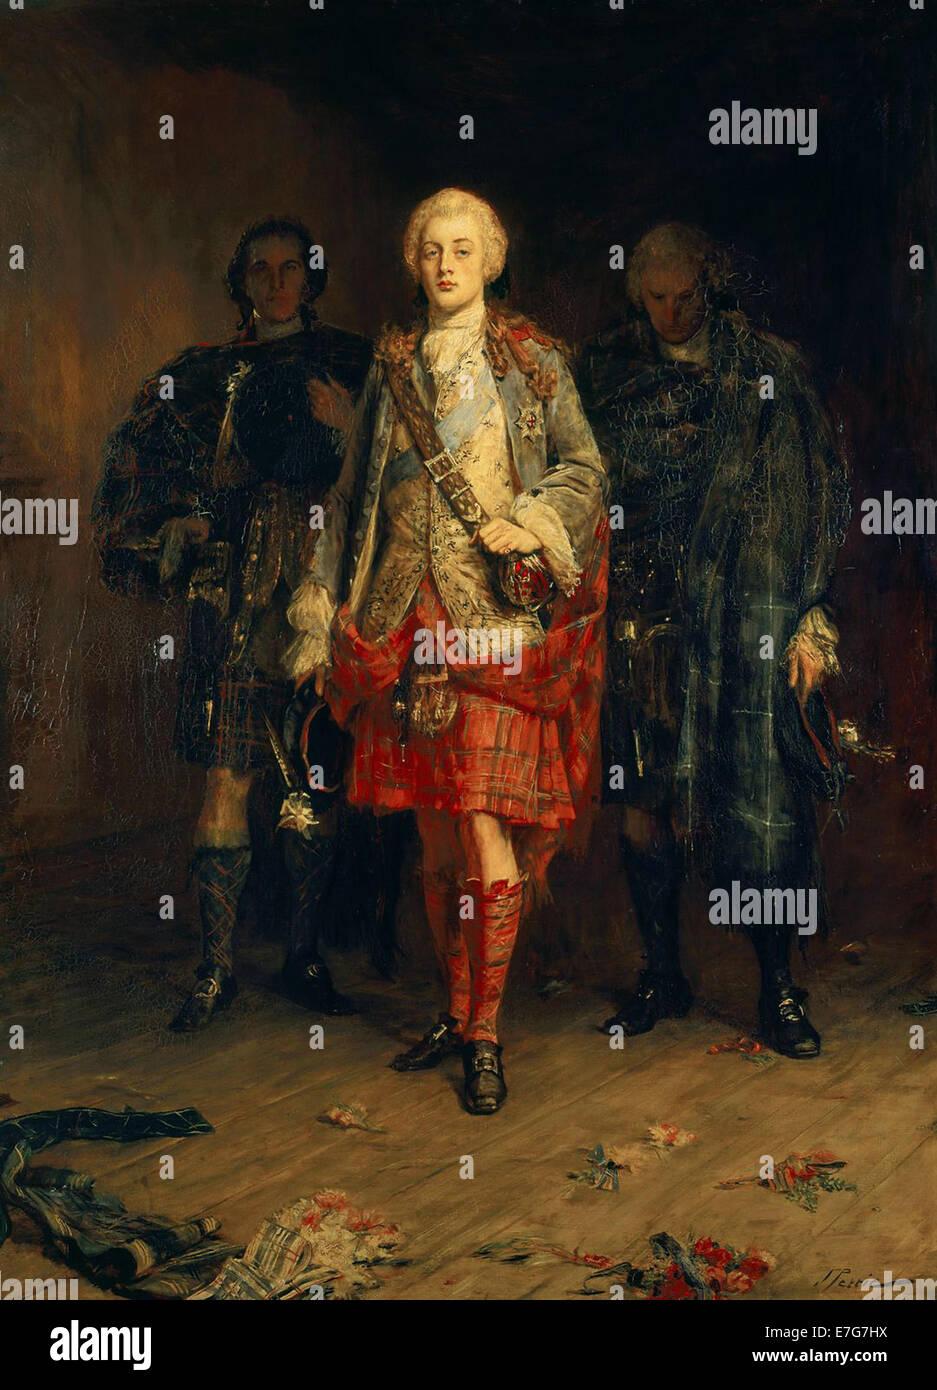 Bonnie Prince Charlie - Stock Image